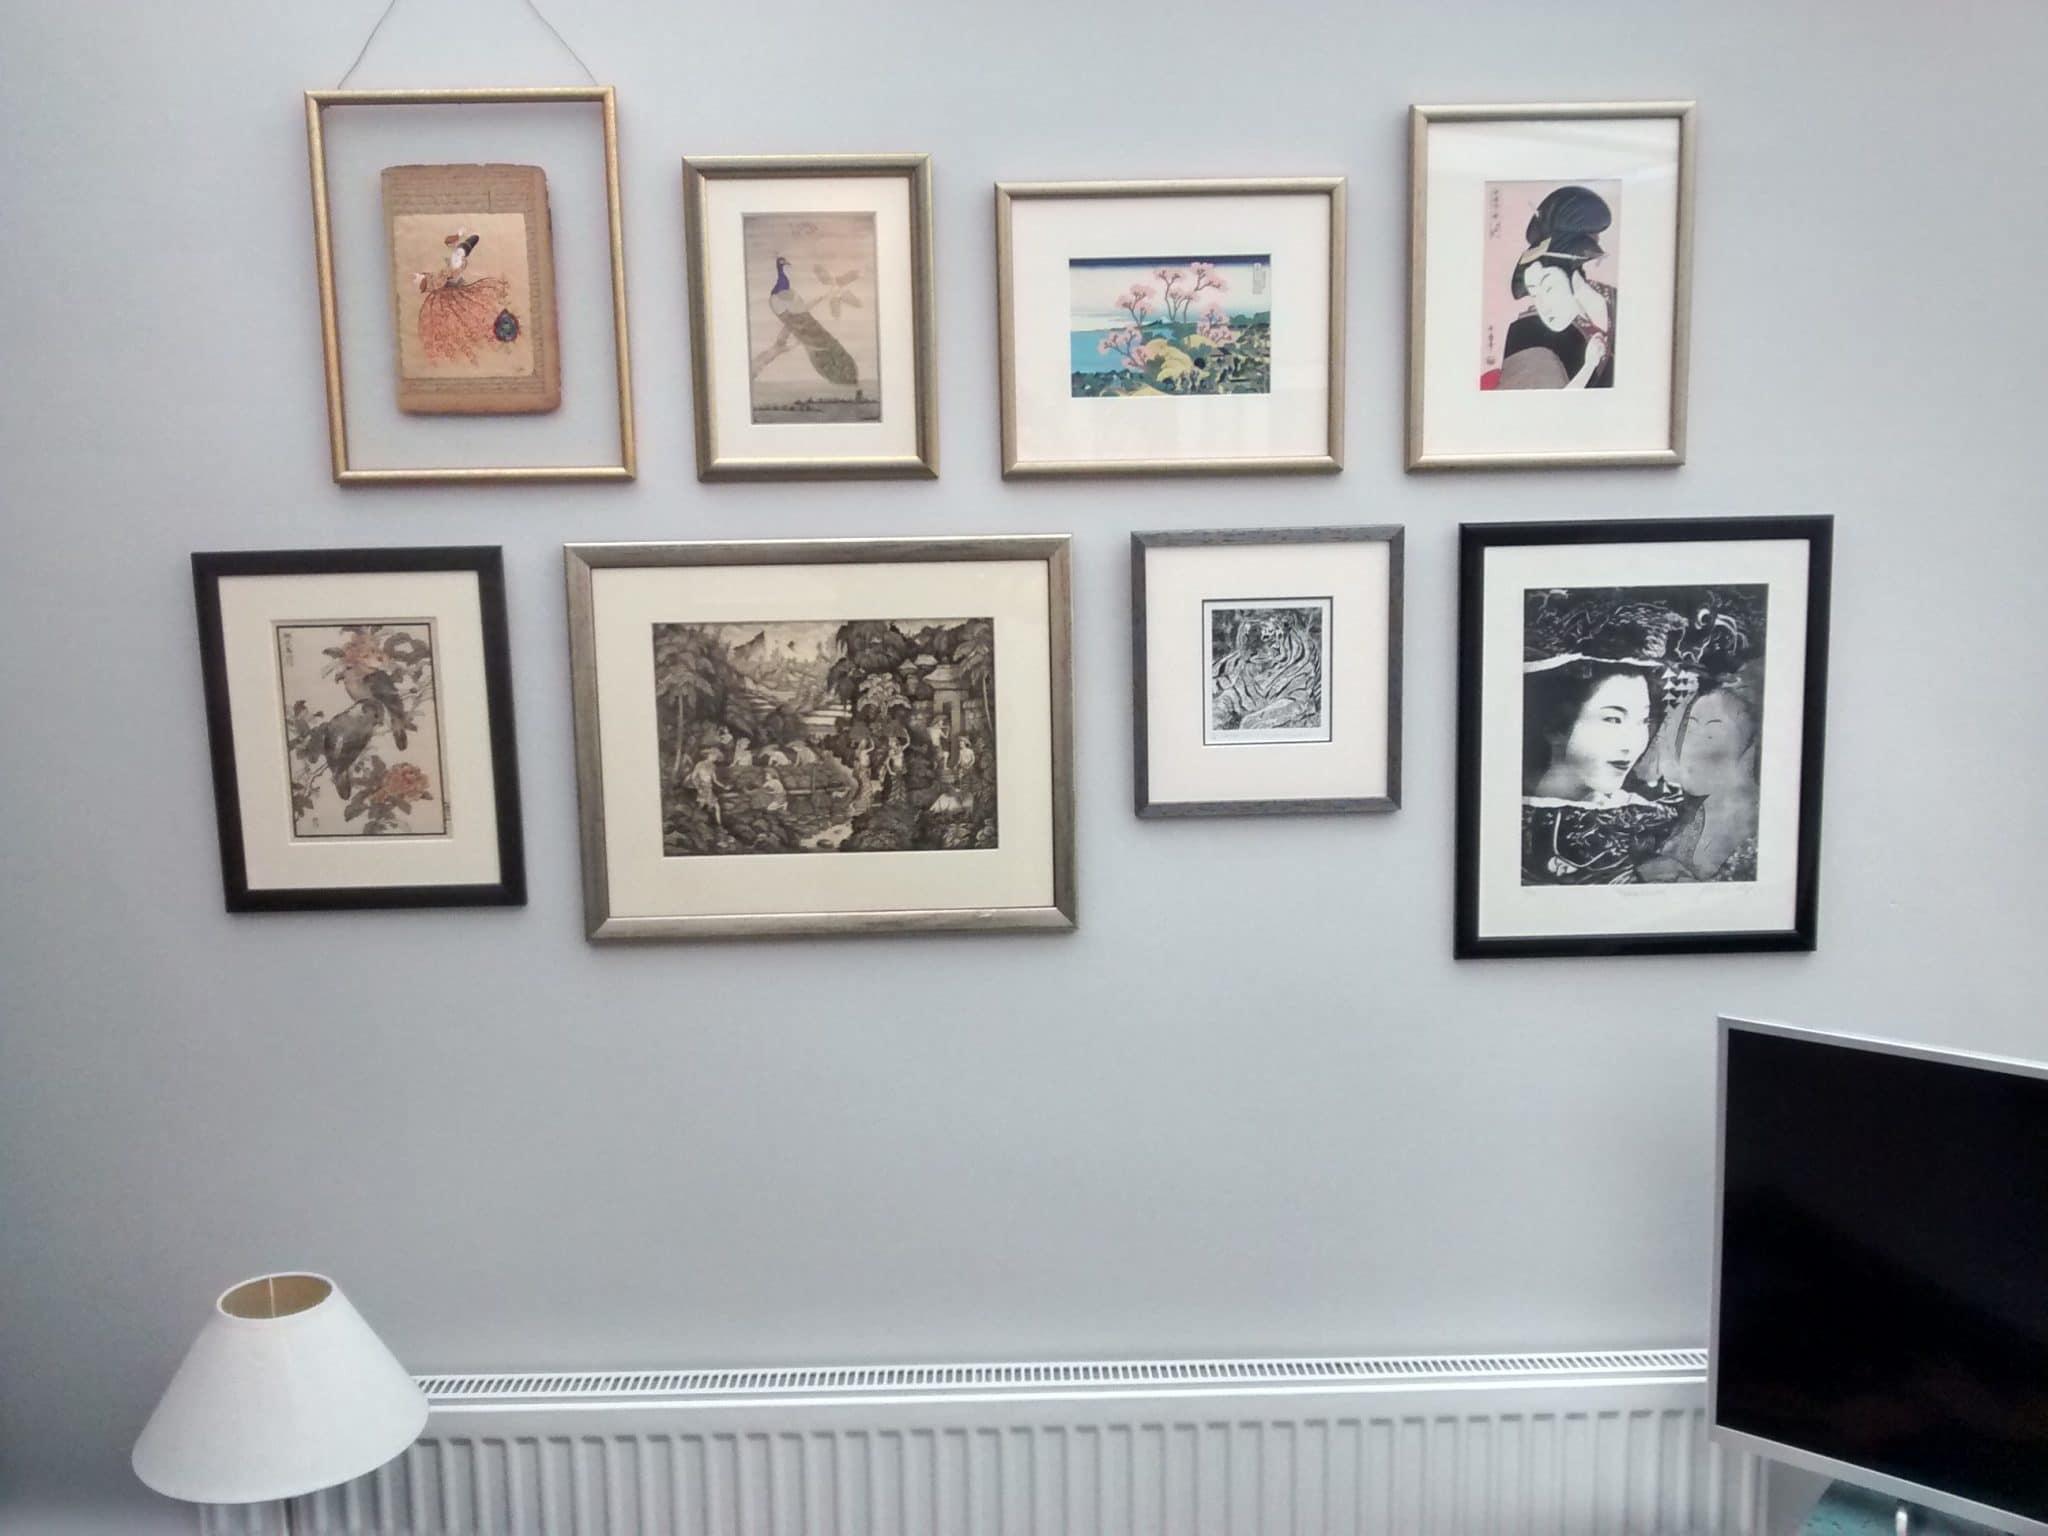 Arranging photos on a wall - Lewisham Arranging Around A Horizontal Central Line Hang